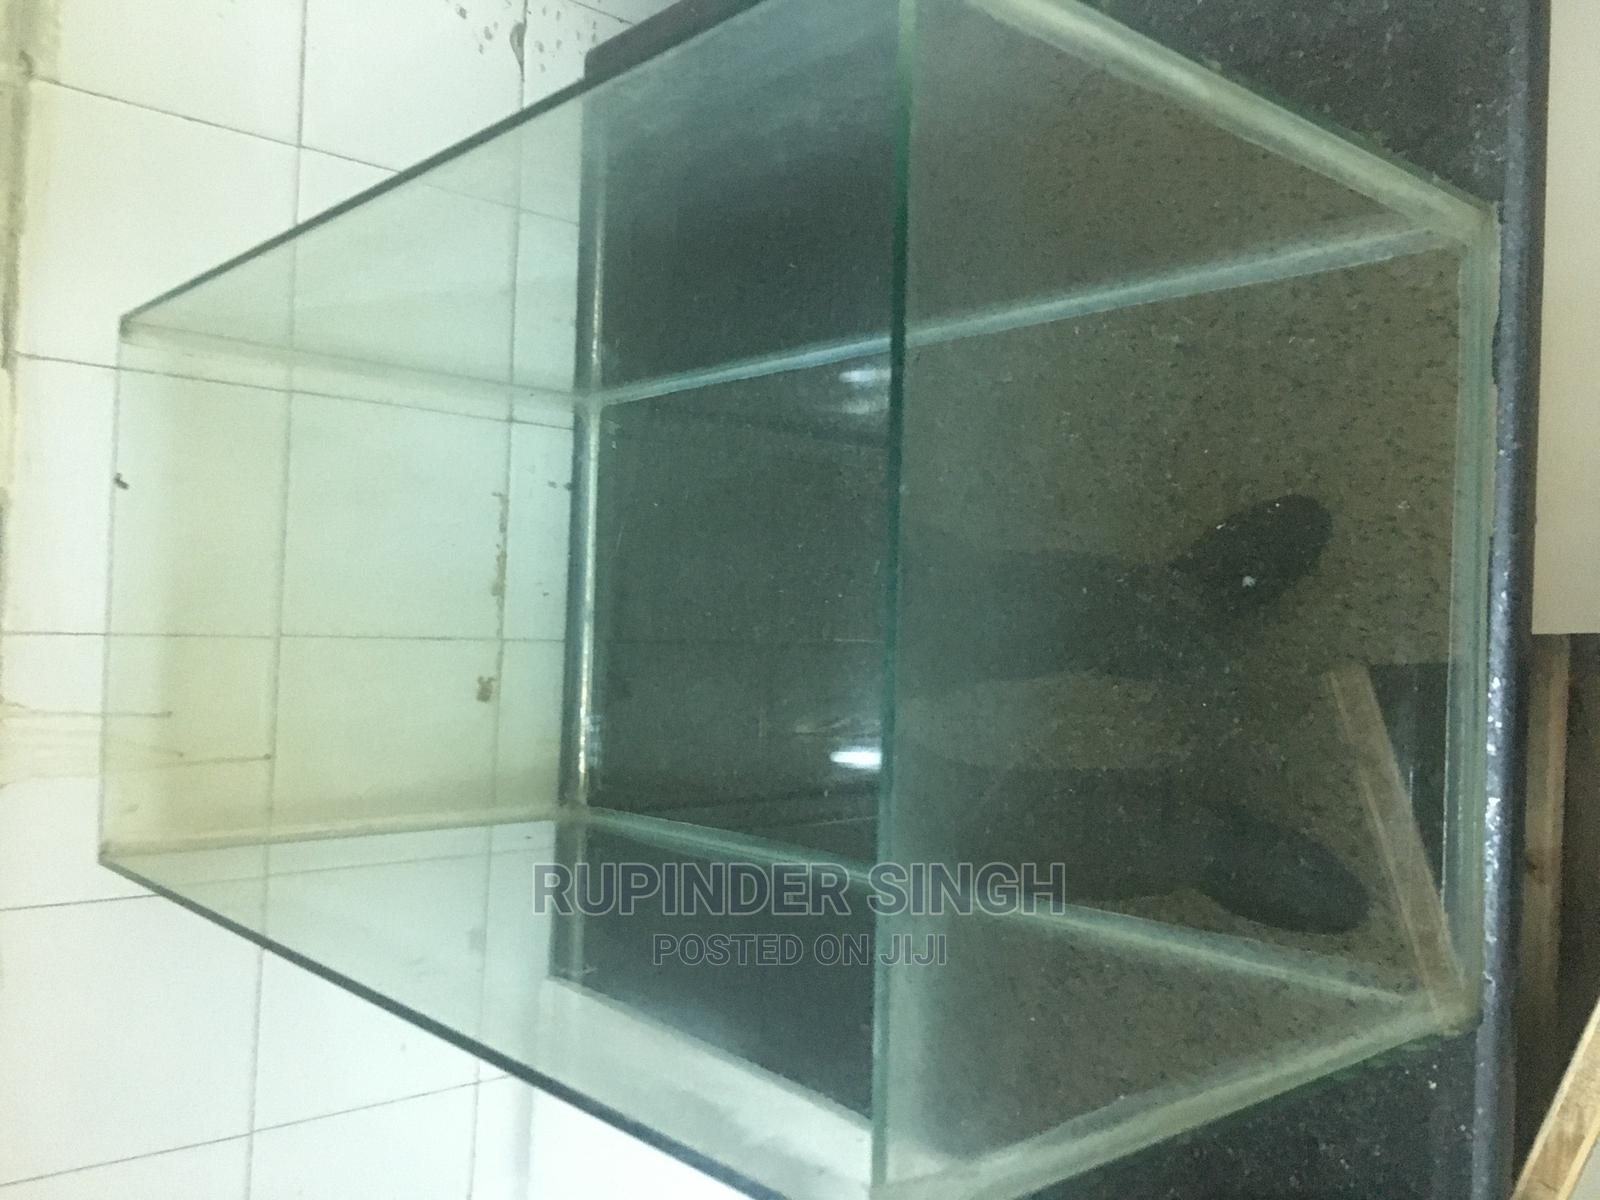 Glass Aquriums | Fish for sale in South C, Nairobi, Kenya